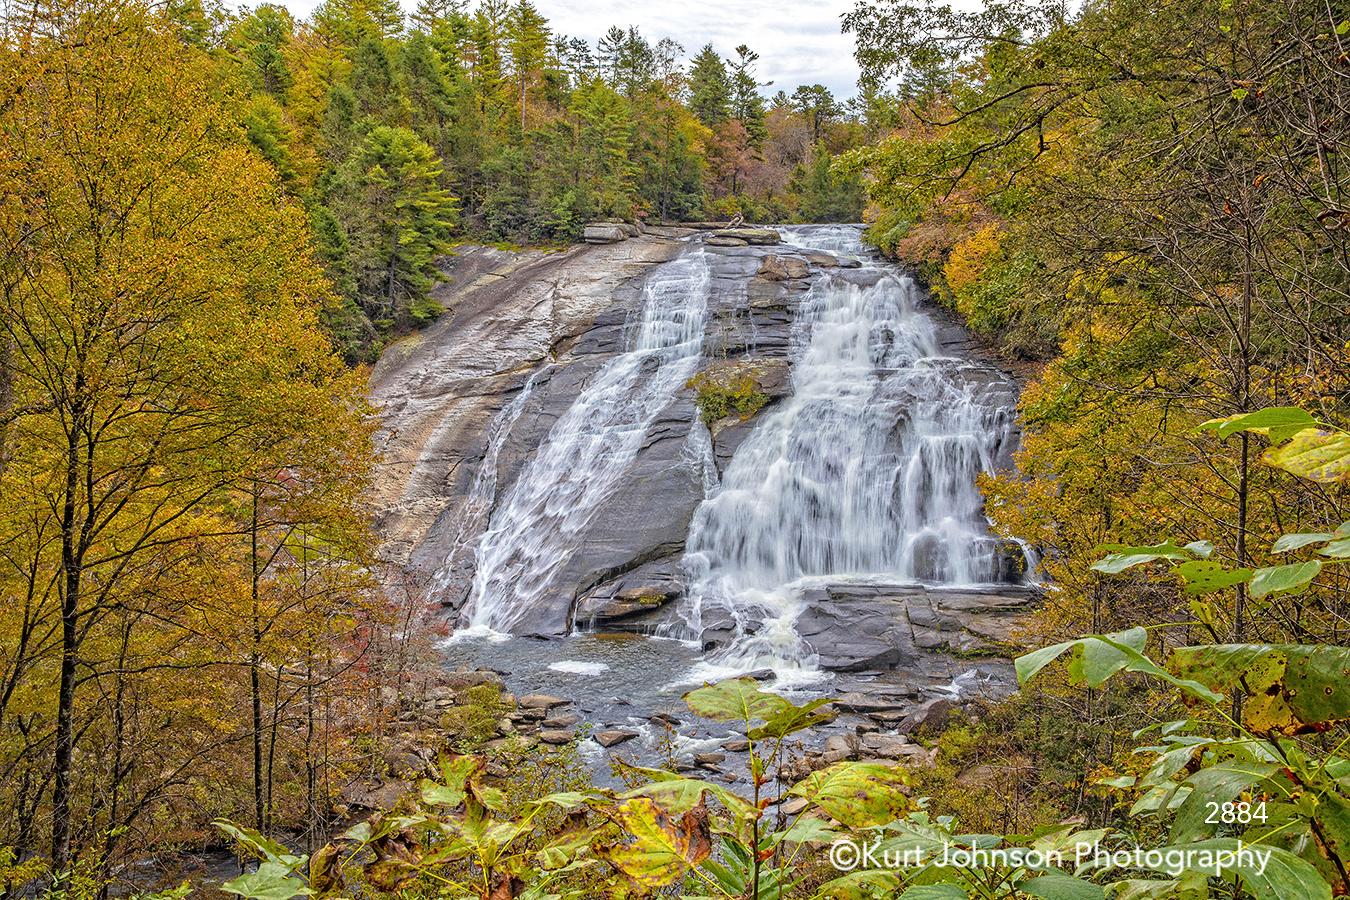 waterfall running water stream cliff mountain yellow gold orange green autumn fall brown rocks